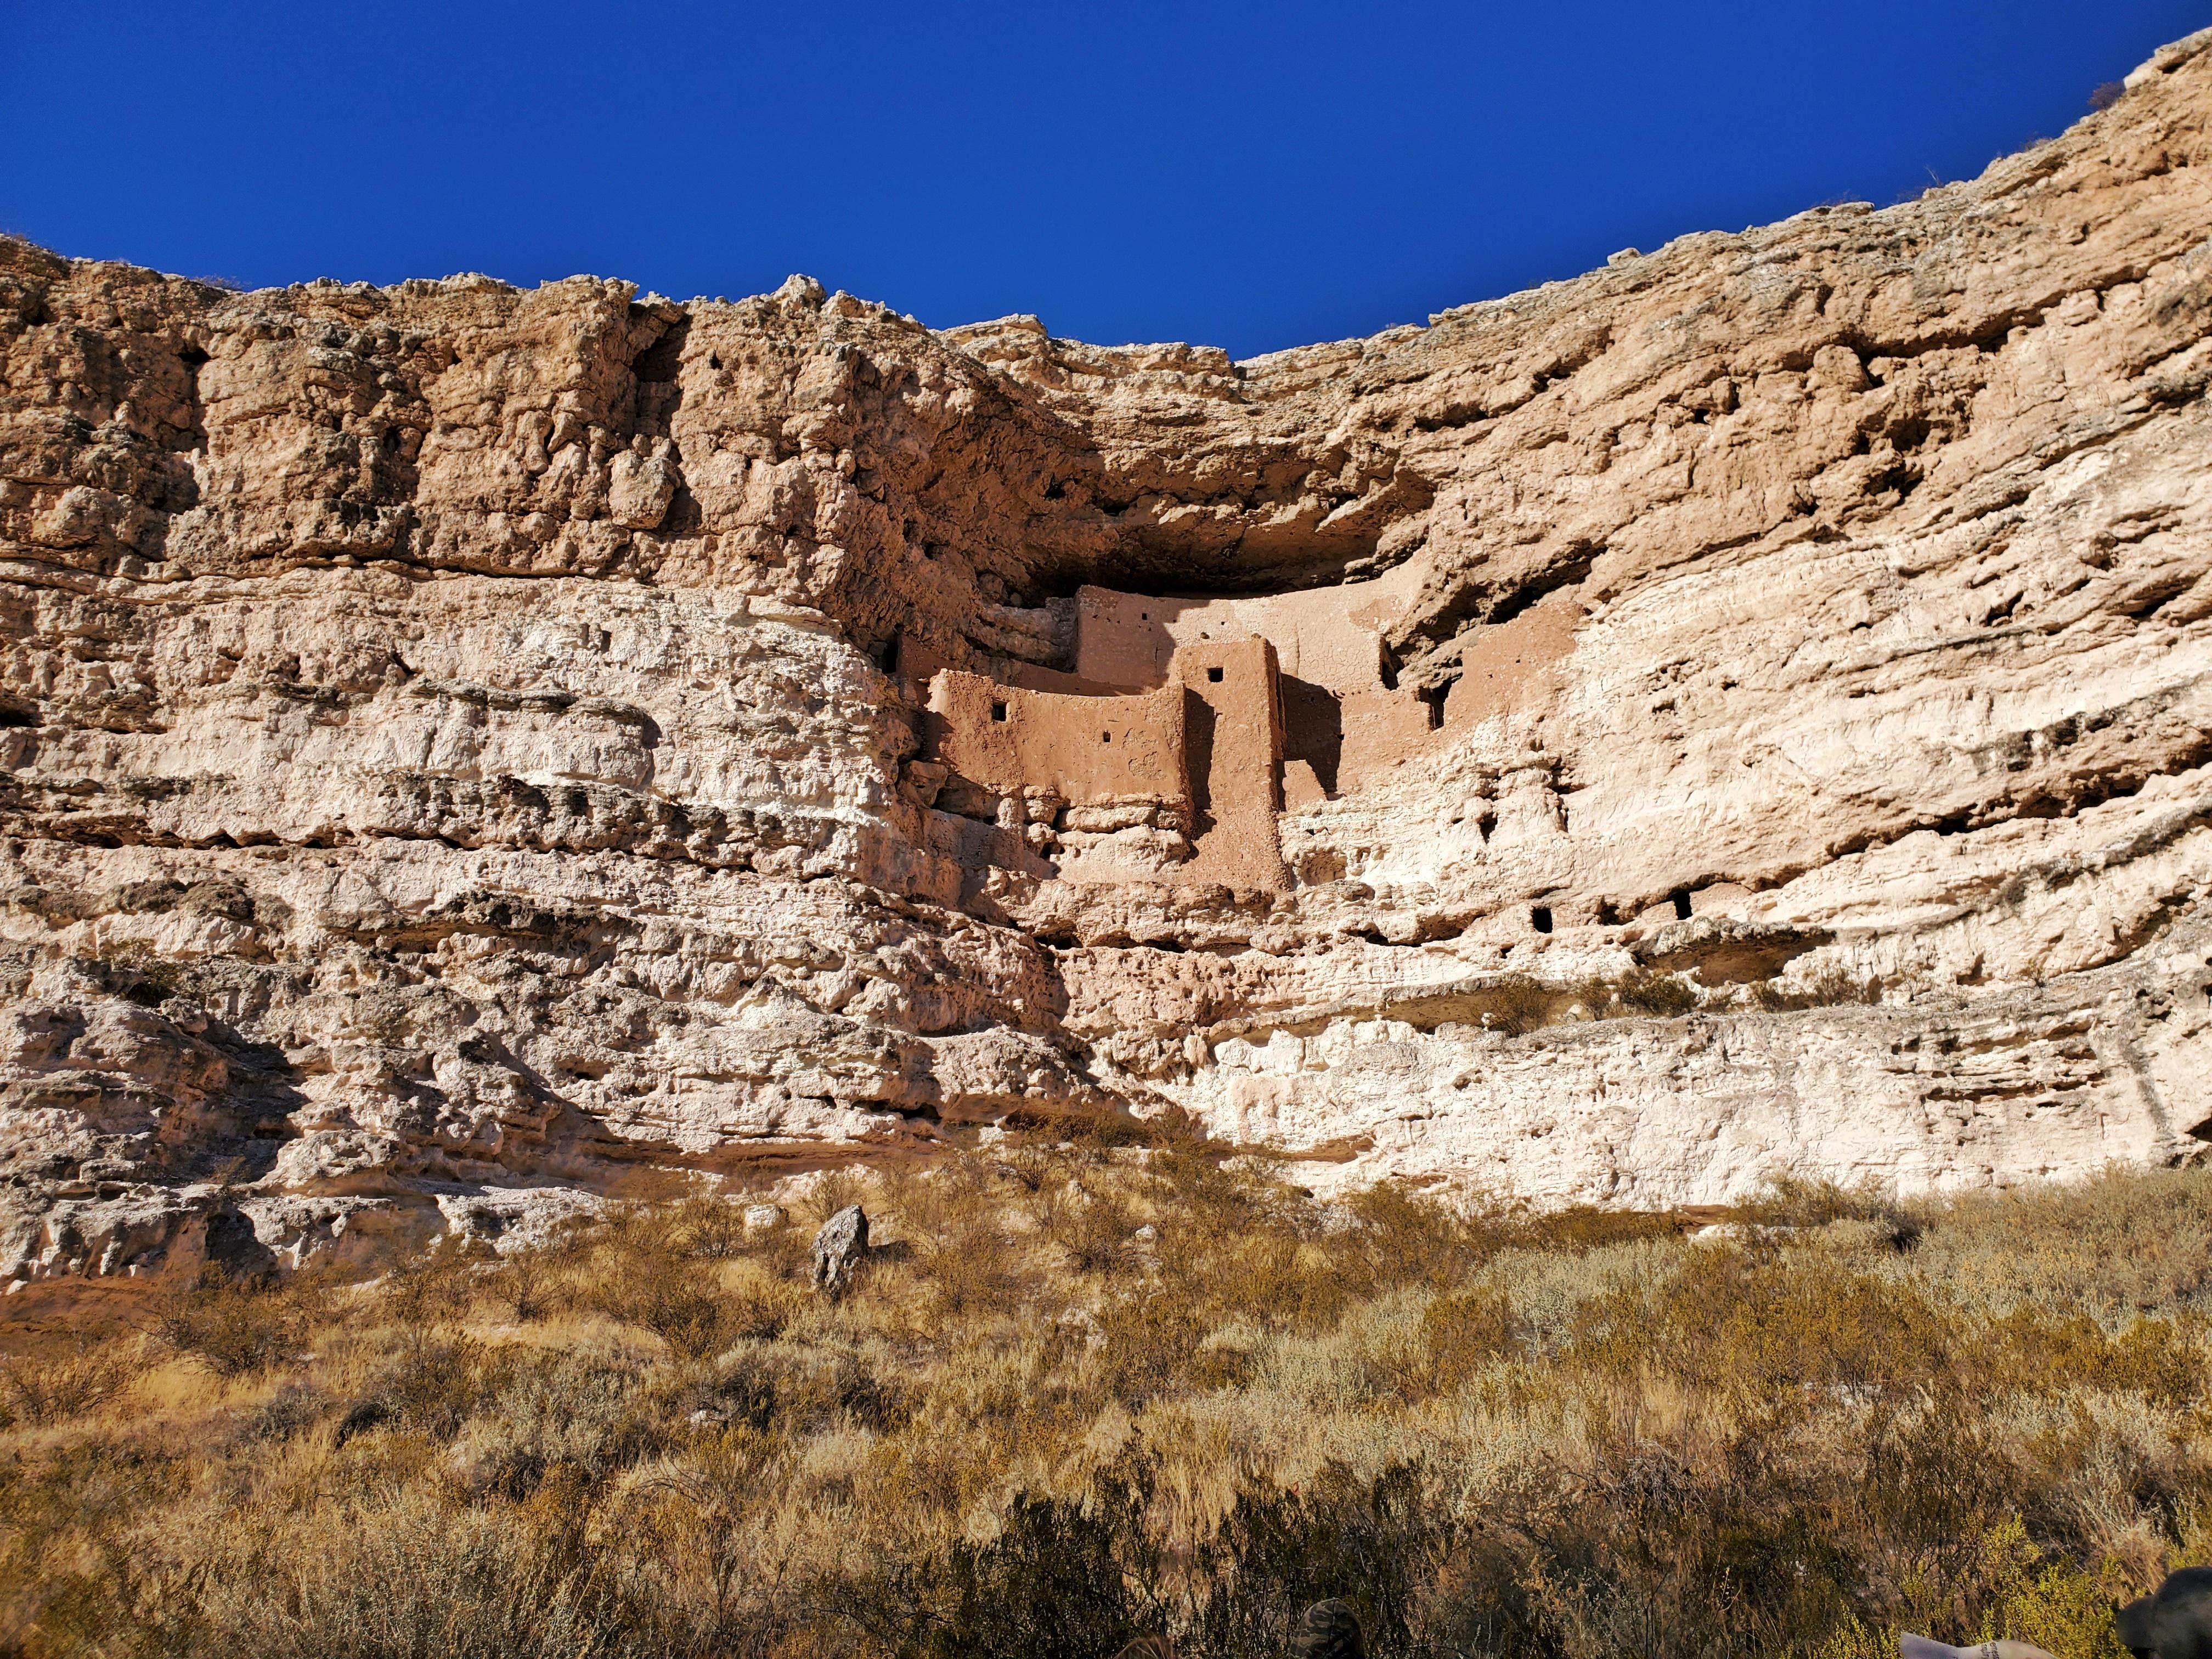 montezuma castle in limestone cliff